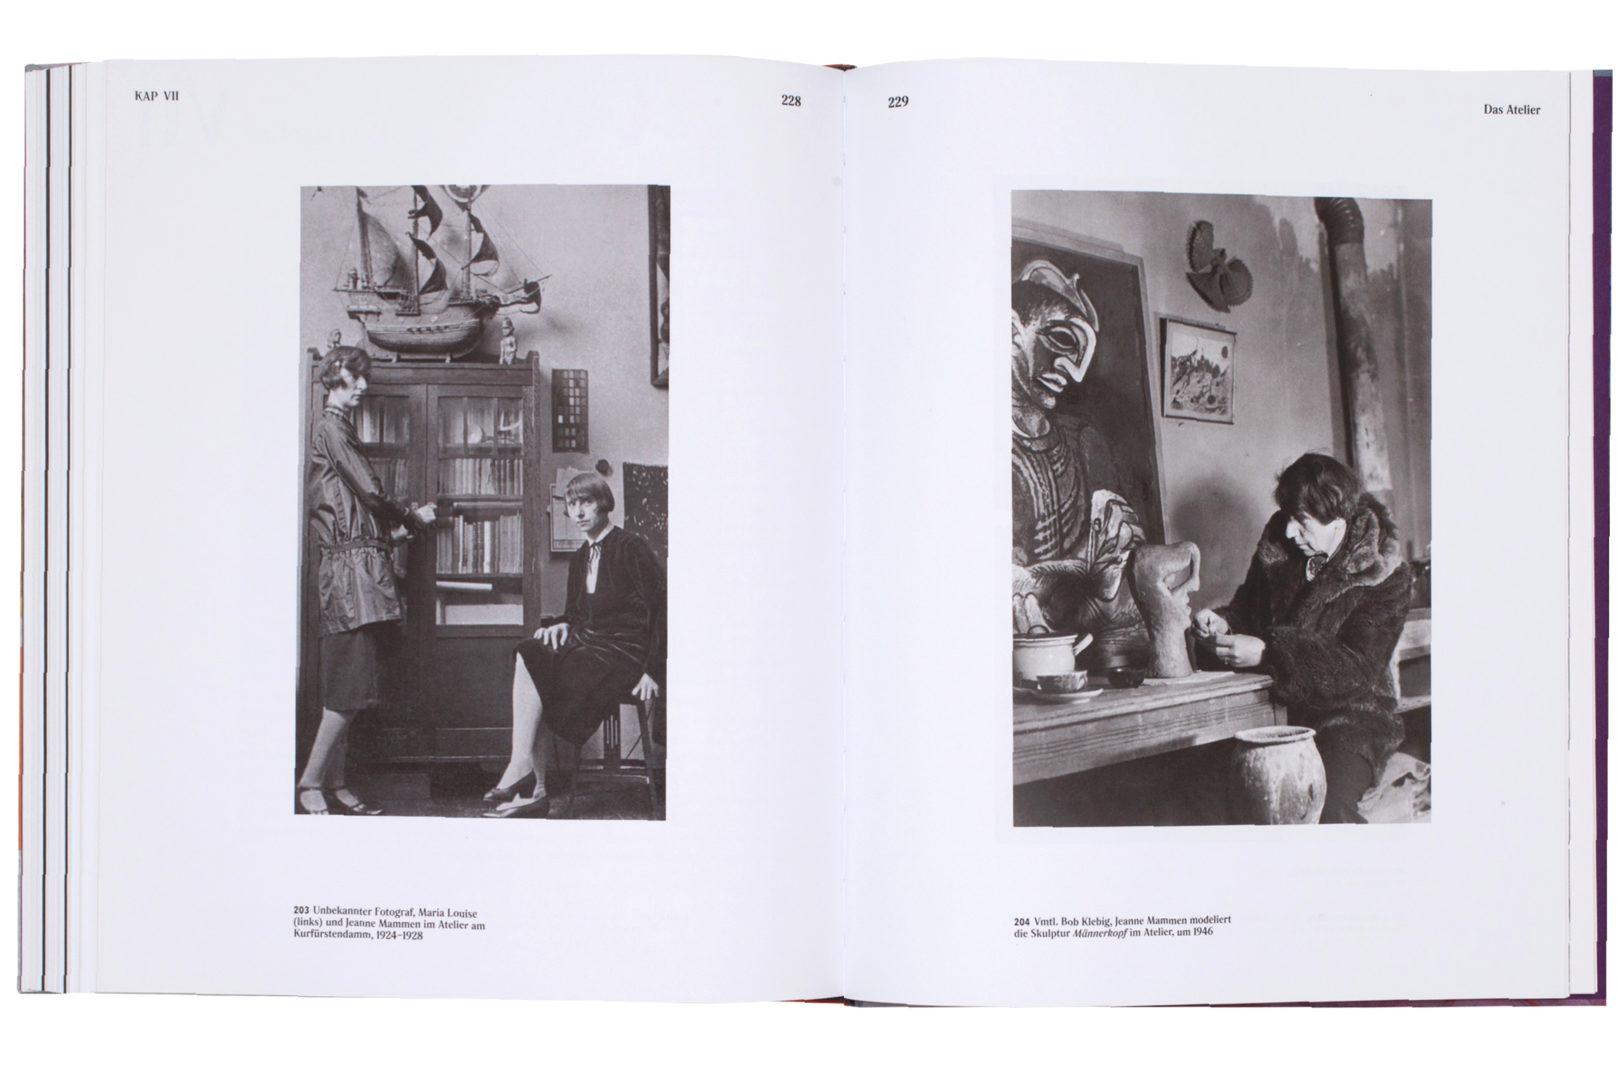 http://e-o-t.de/wordpress/wp-content/uploads/2017/12/2017-Books-Thumb-FotoFerne17.jpg